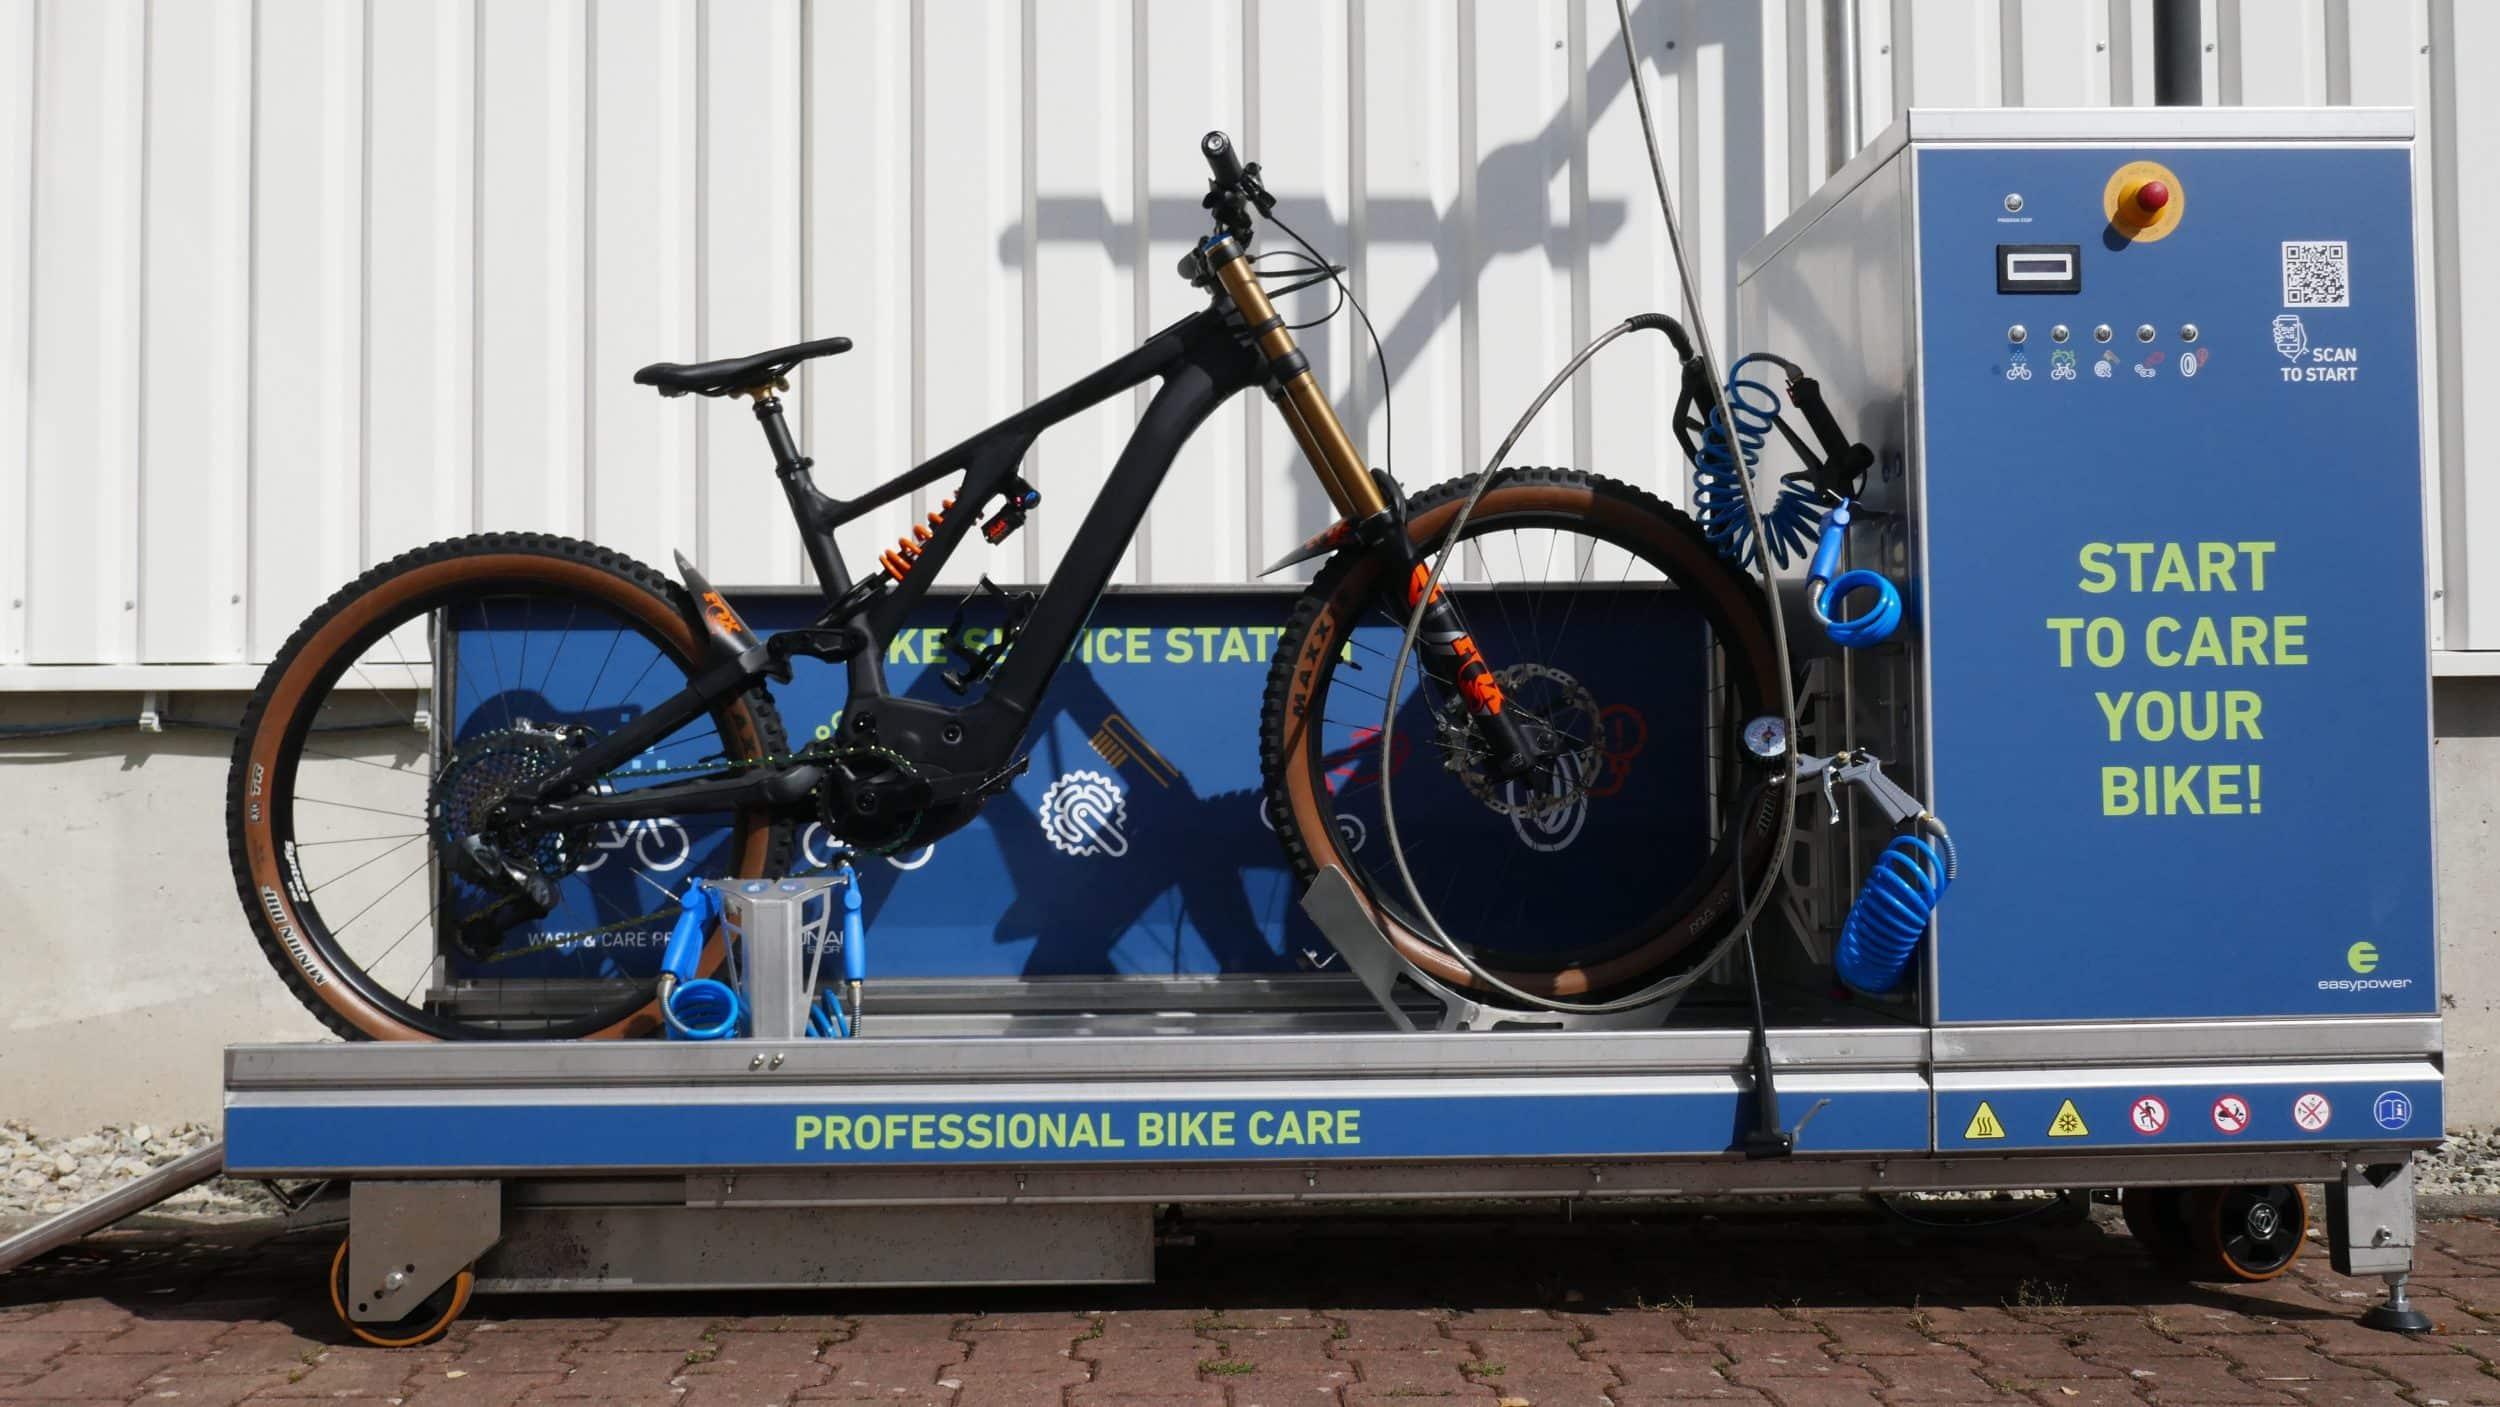 Bike Service Station